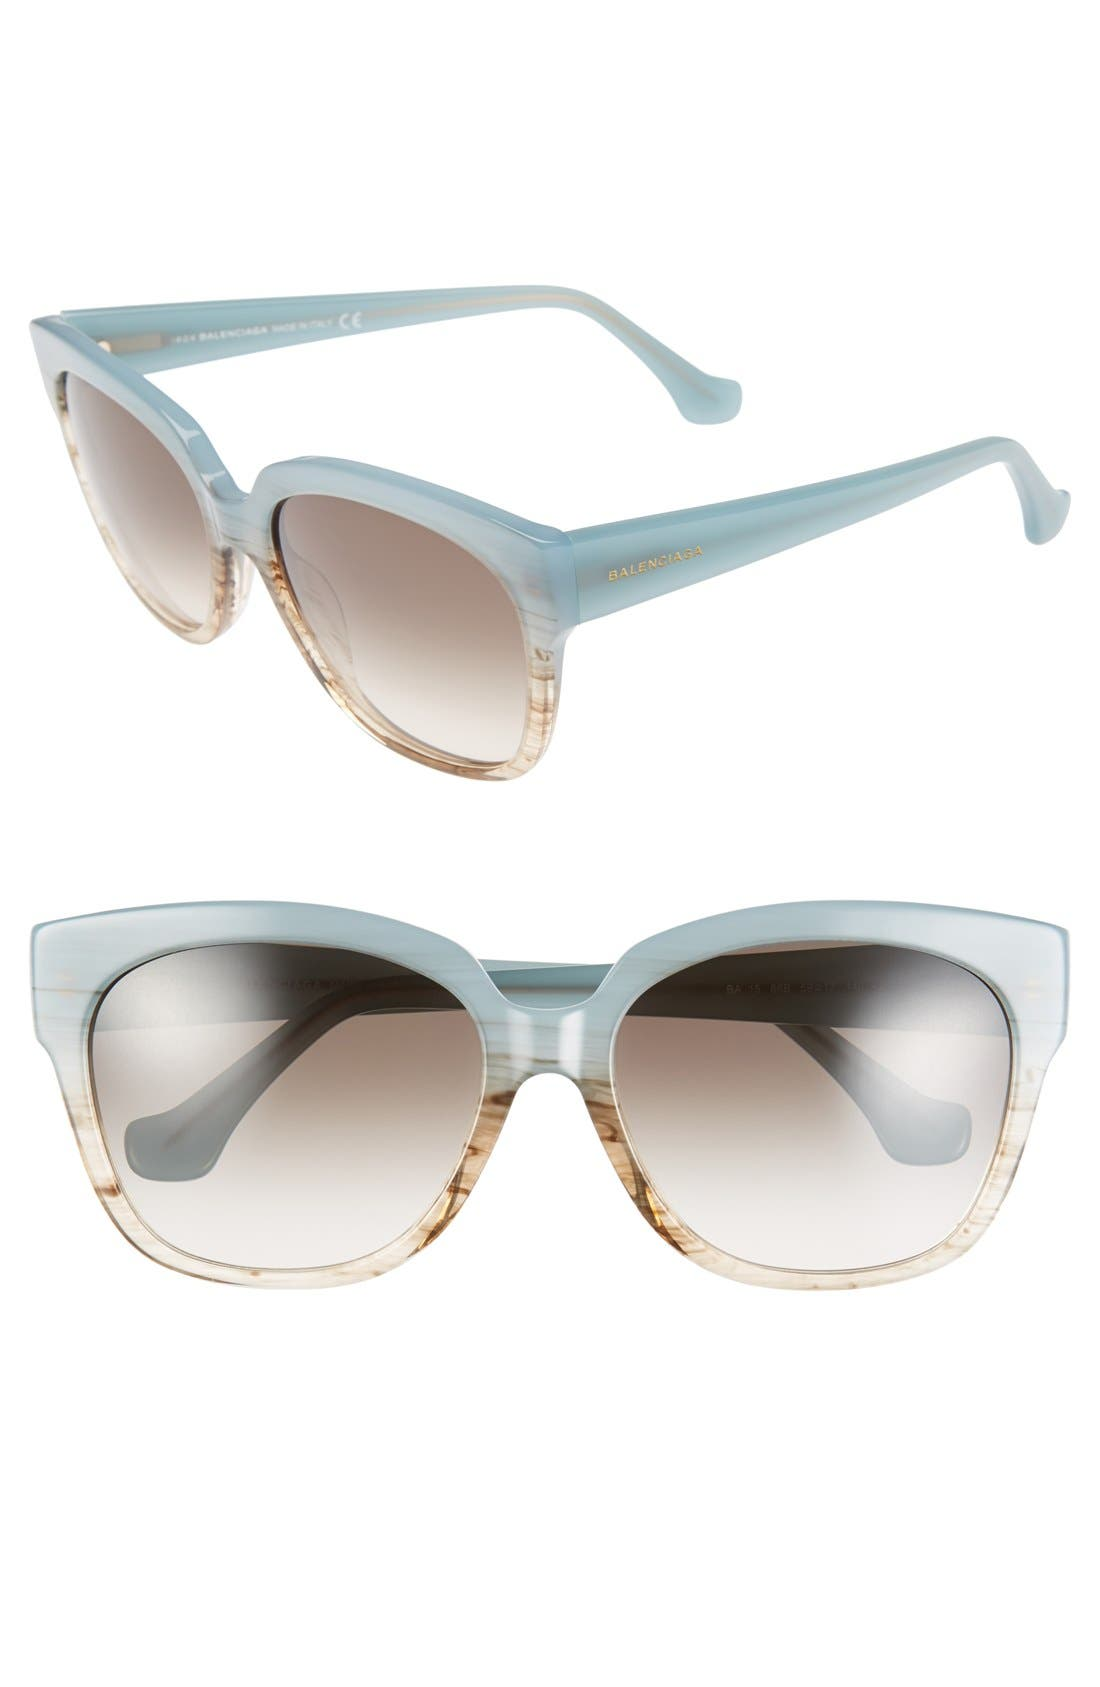 Main Image - Balenciaga 59mm 'BA0015' Sunglasses